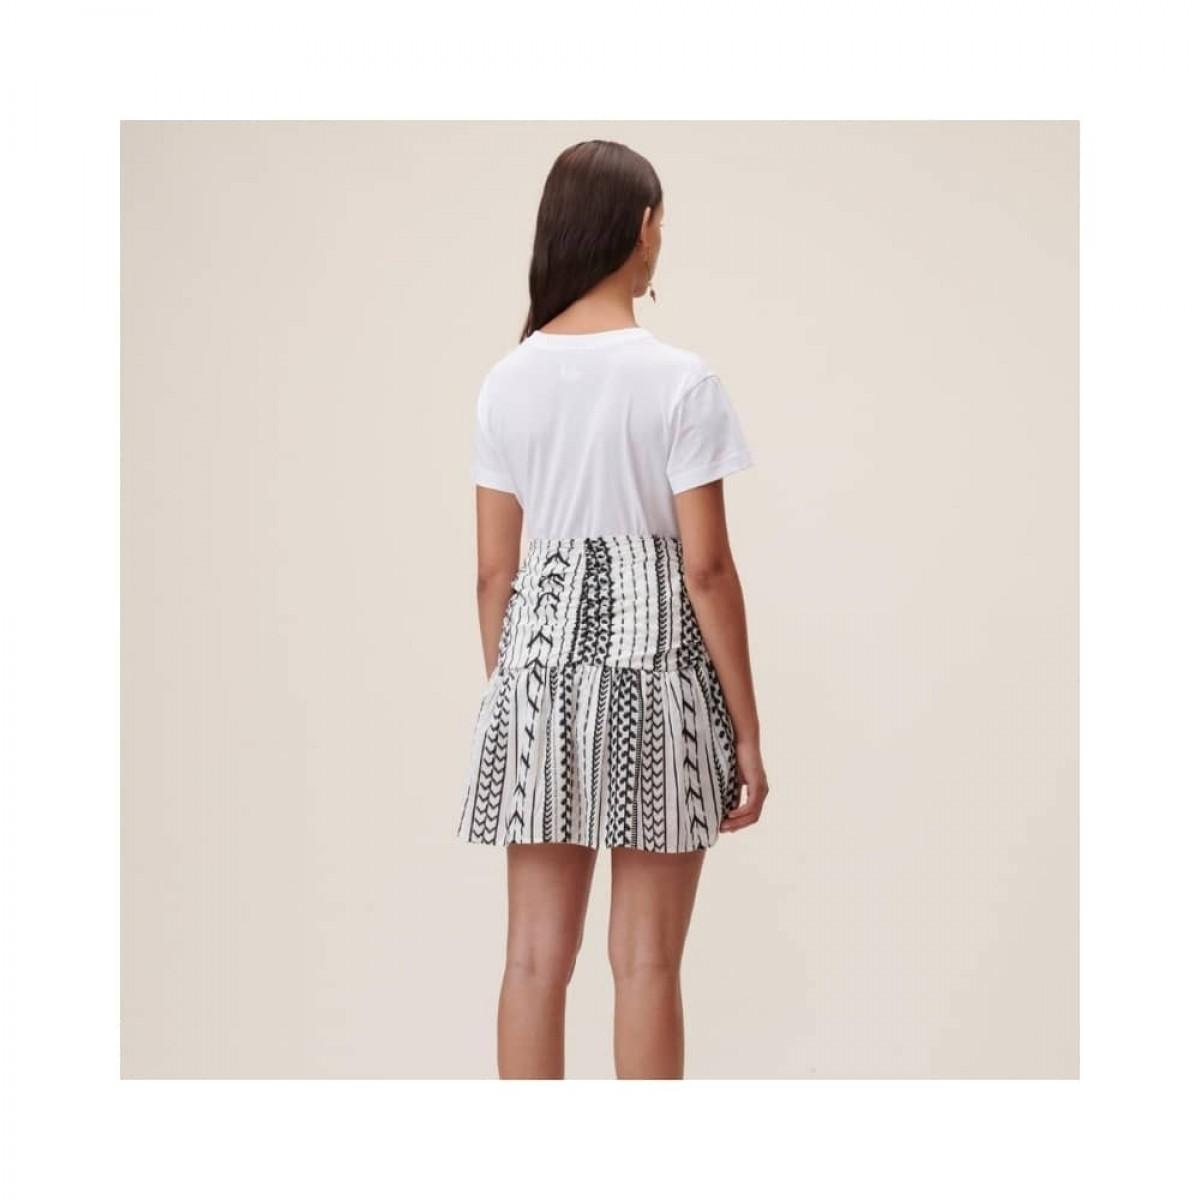 cara heart t-shirt - white - model ryg